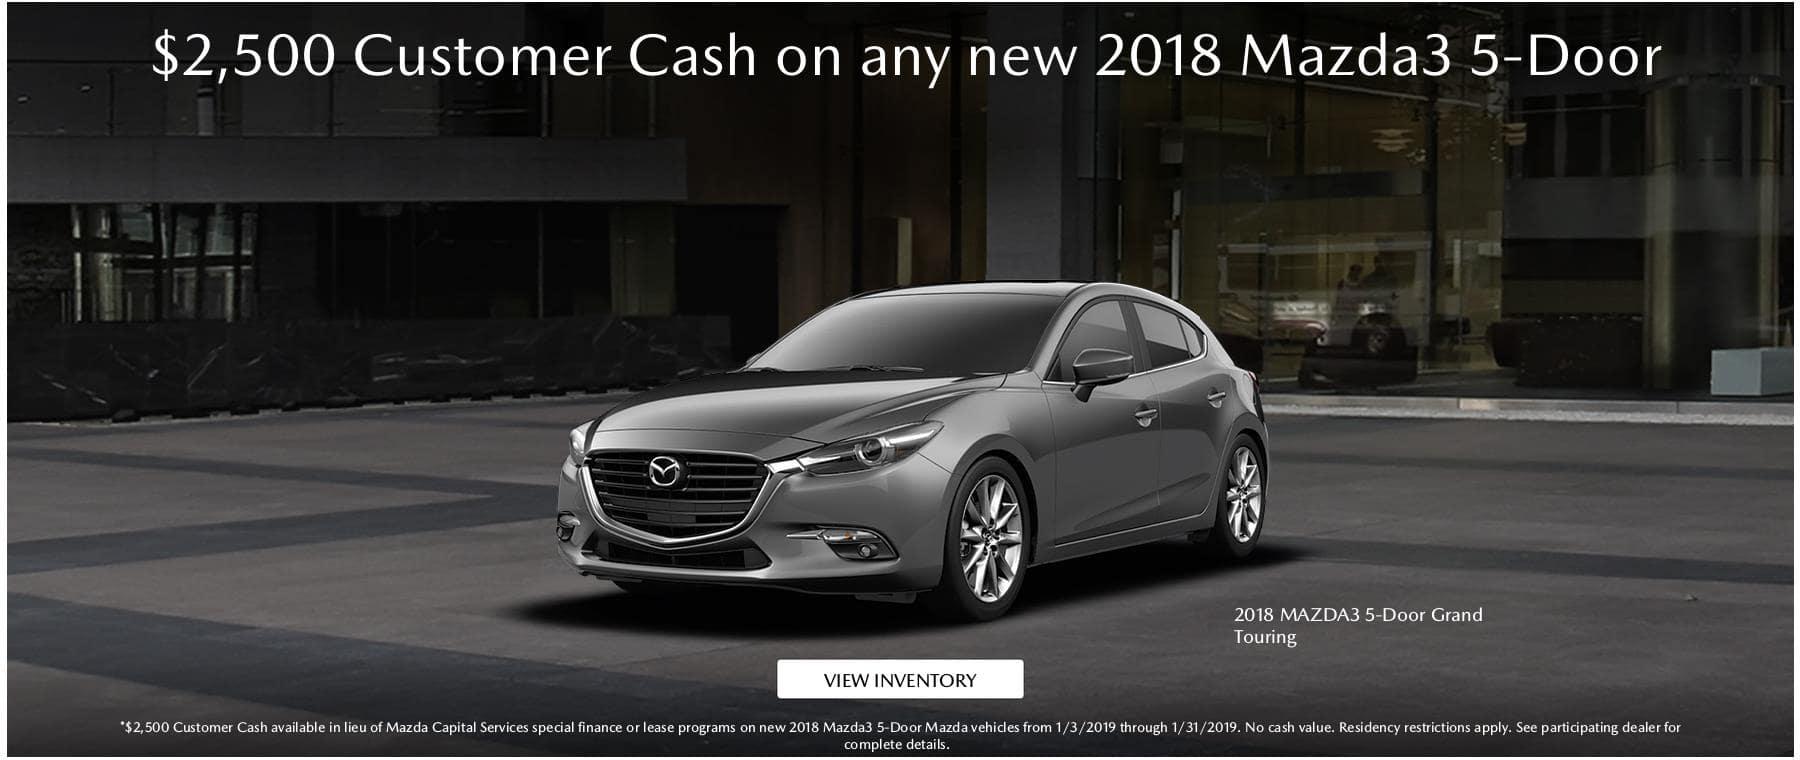 MY18 Mazda3 5dr 2500 CC_1800x760